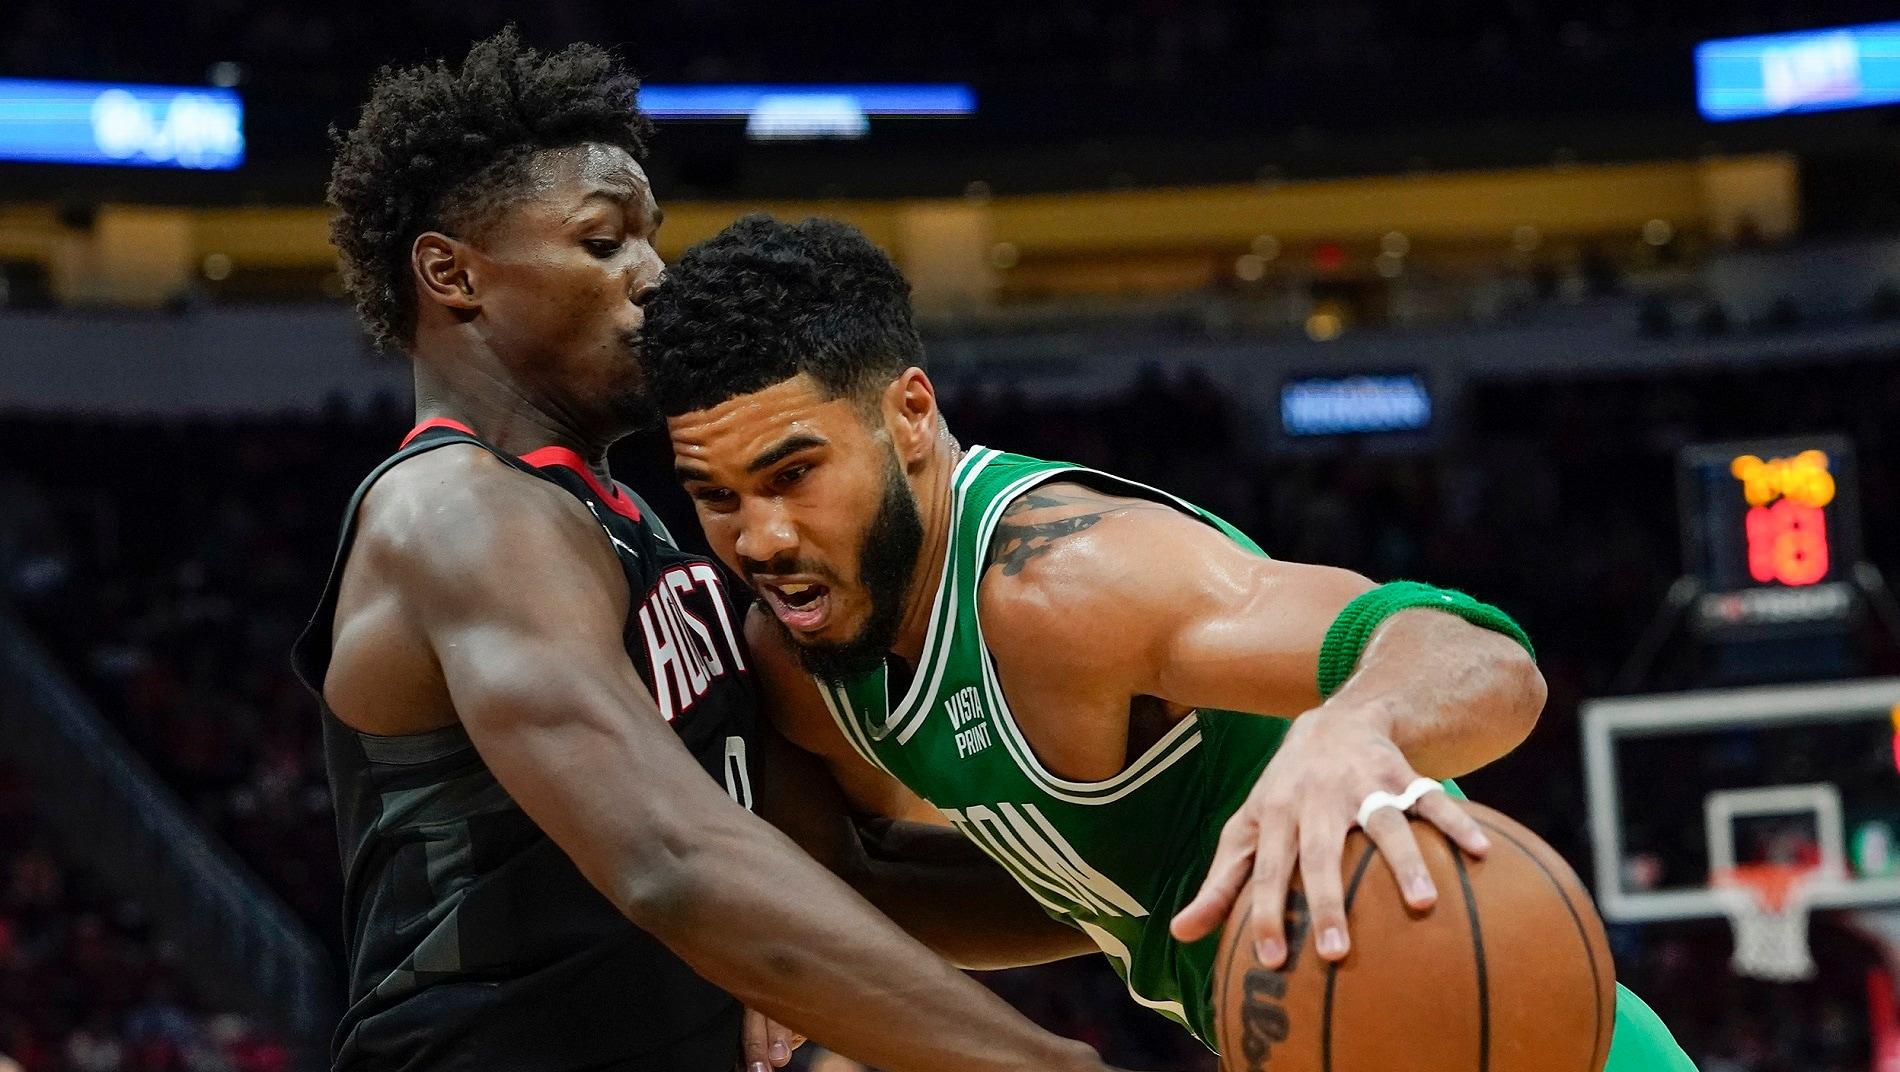 Celtics take on Rockets seeking 1st victory of season